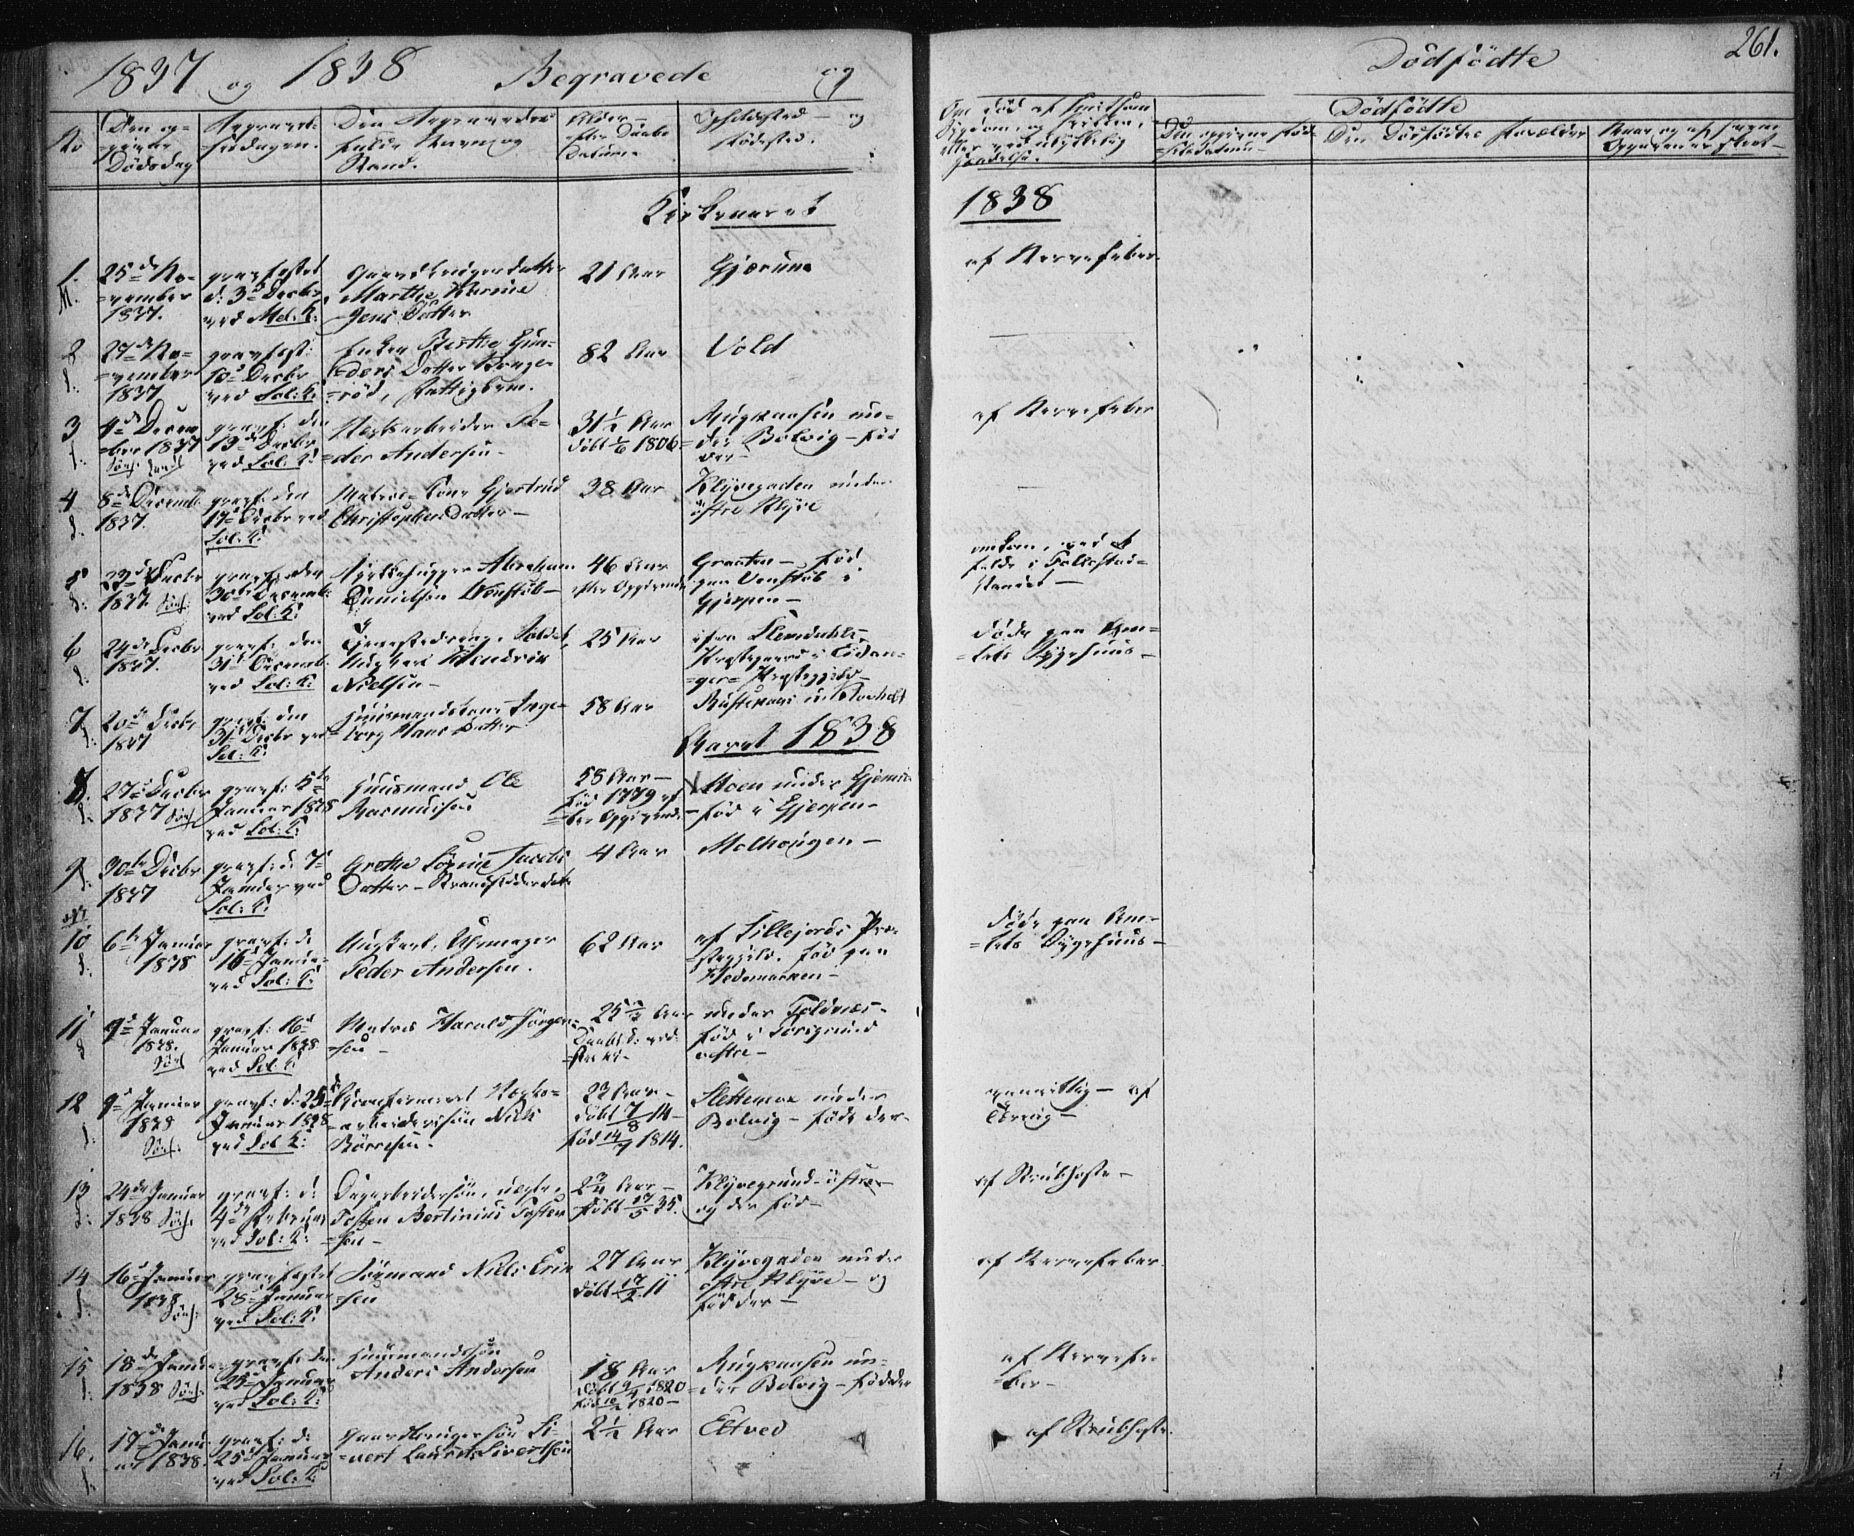 SAKO, Solum kirkebøker, F/Fa/L0005: Ministerialbok nr. I 5, 1833-1843, s. 261